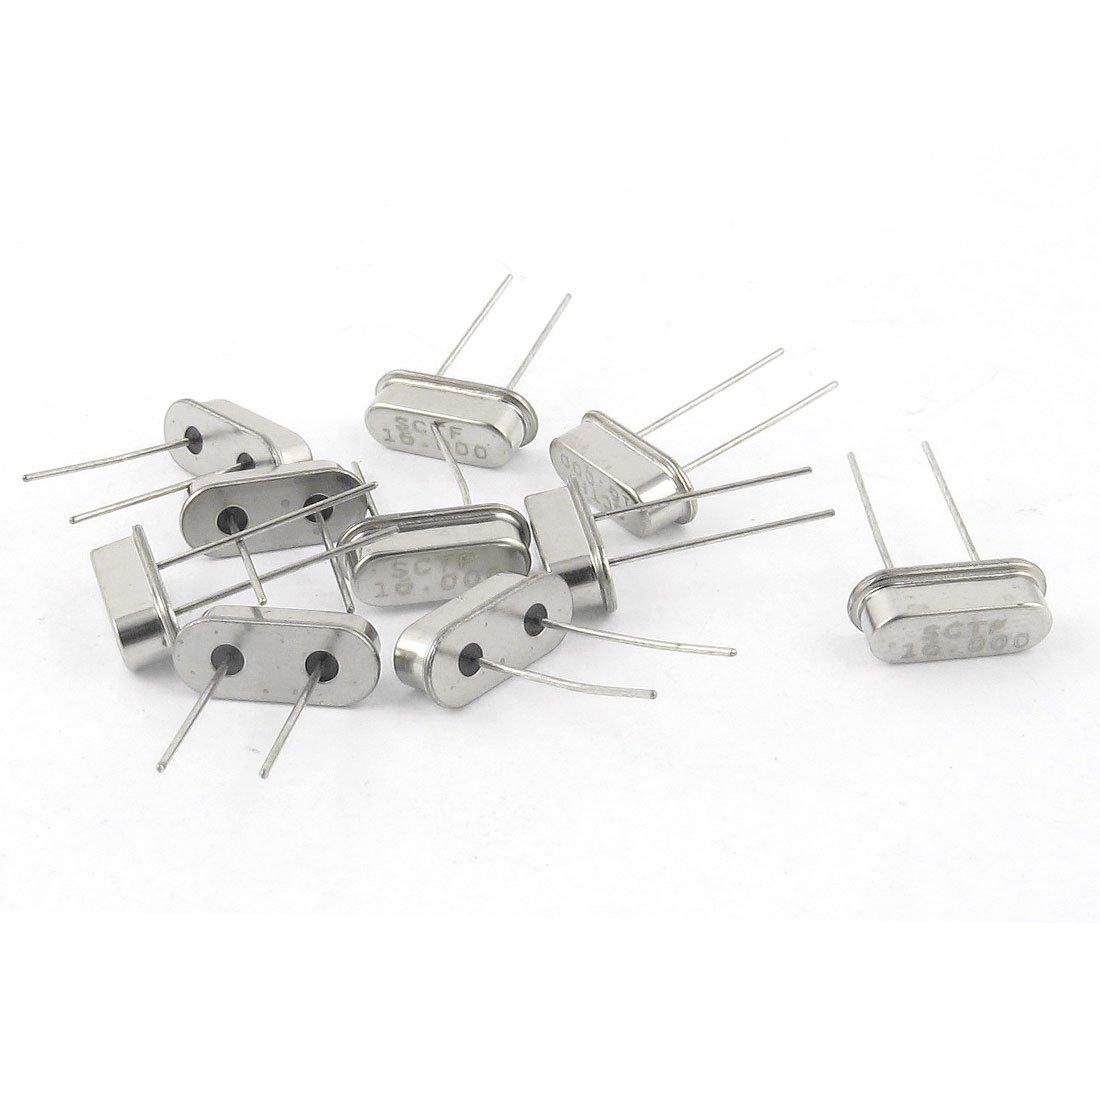 REFURBISHHOUSE 300pcs Ceramic Capacitor Set Pack 2PF-0.1UF 30 valuesx10pcs Electronic Components Package Capacitor Assorted Kit Samples DIY